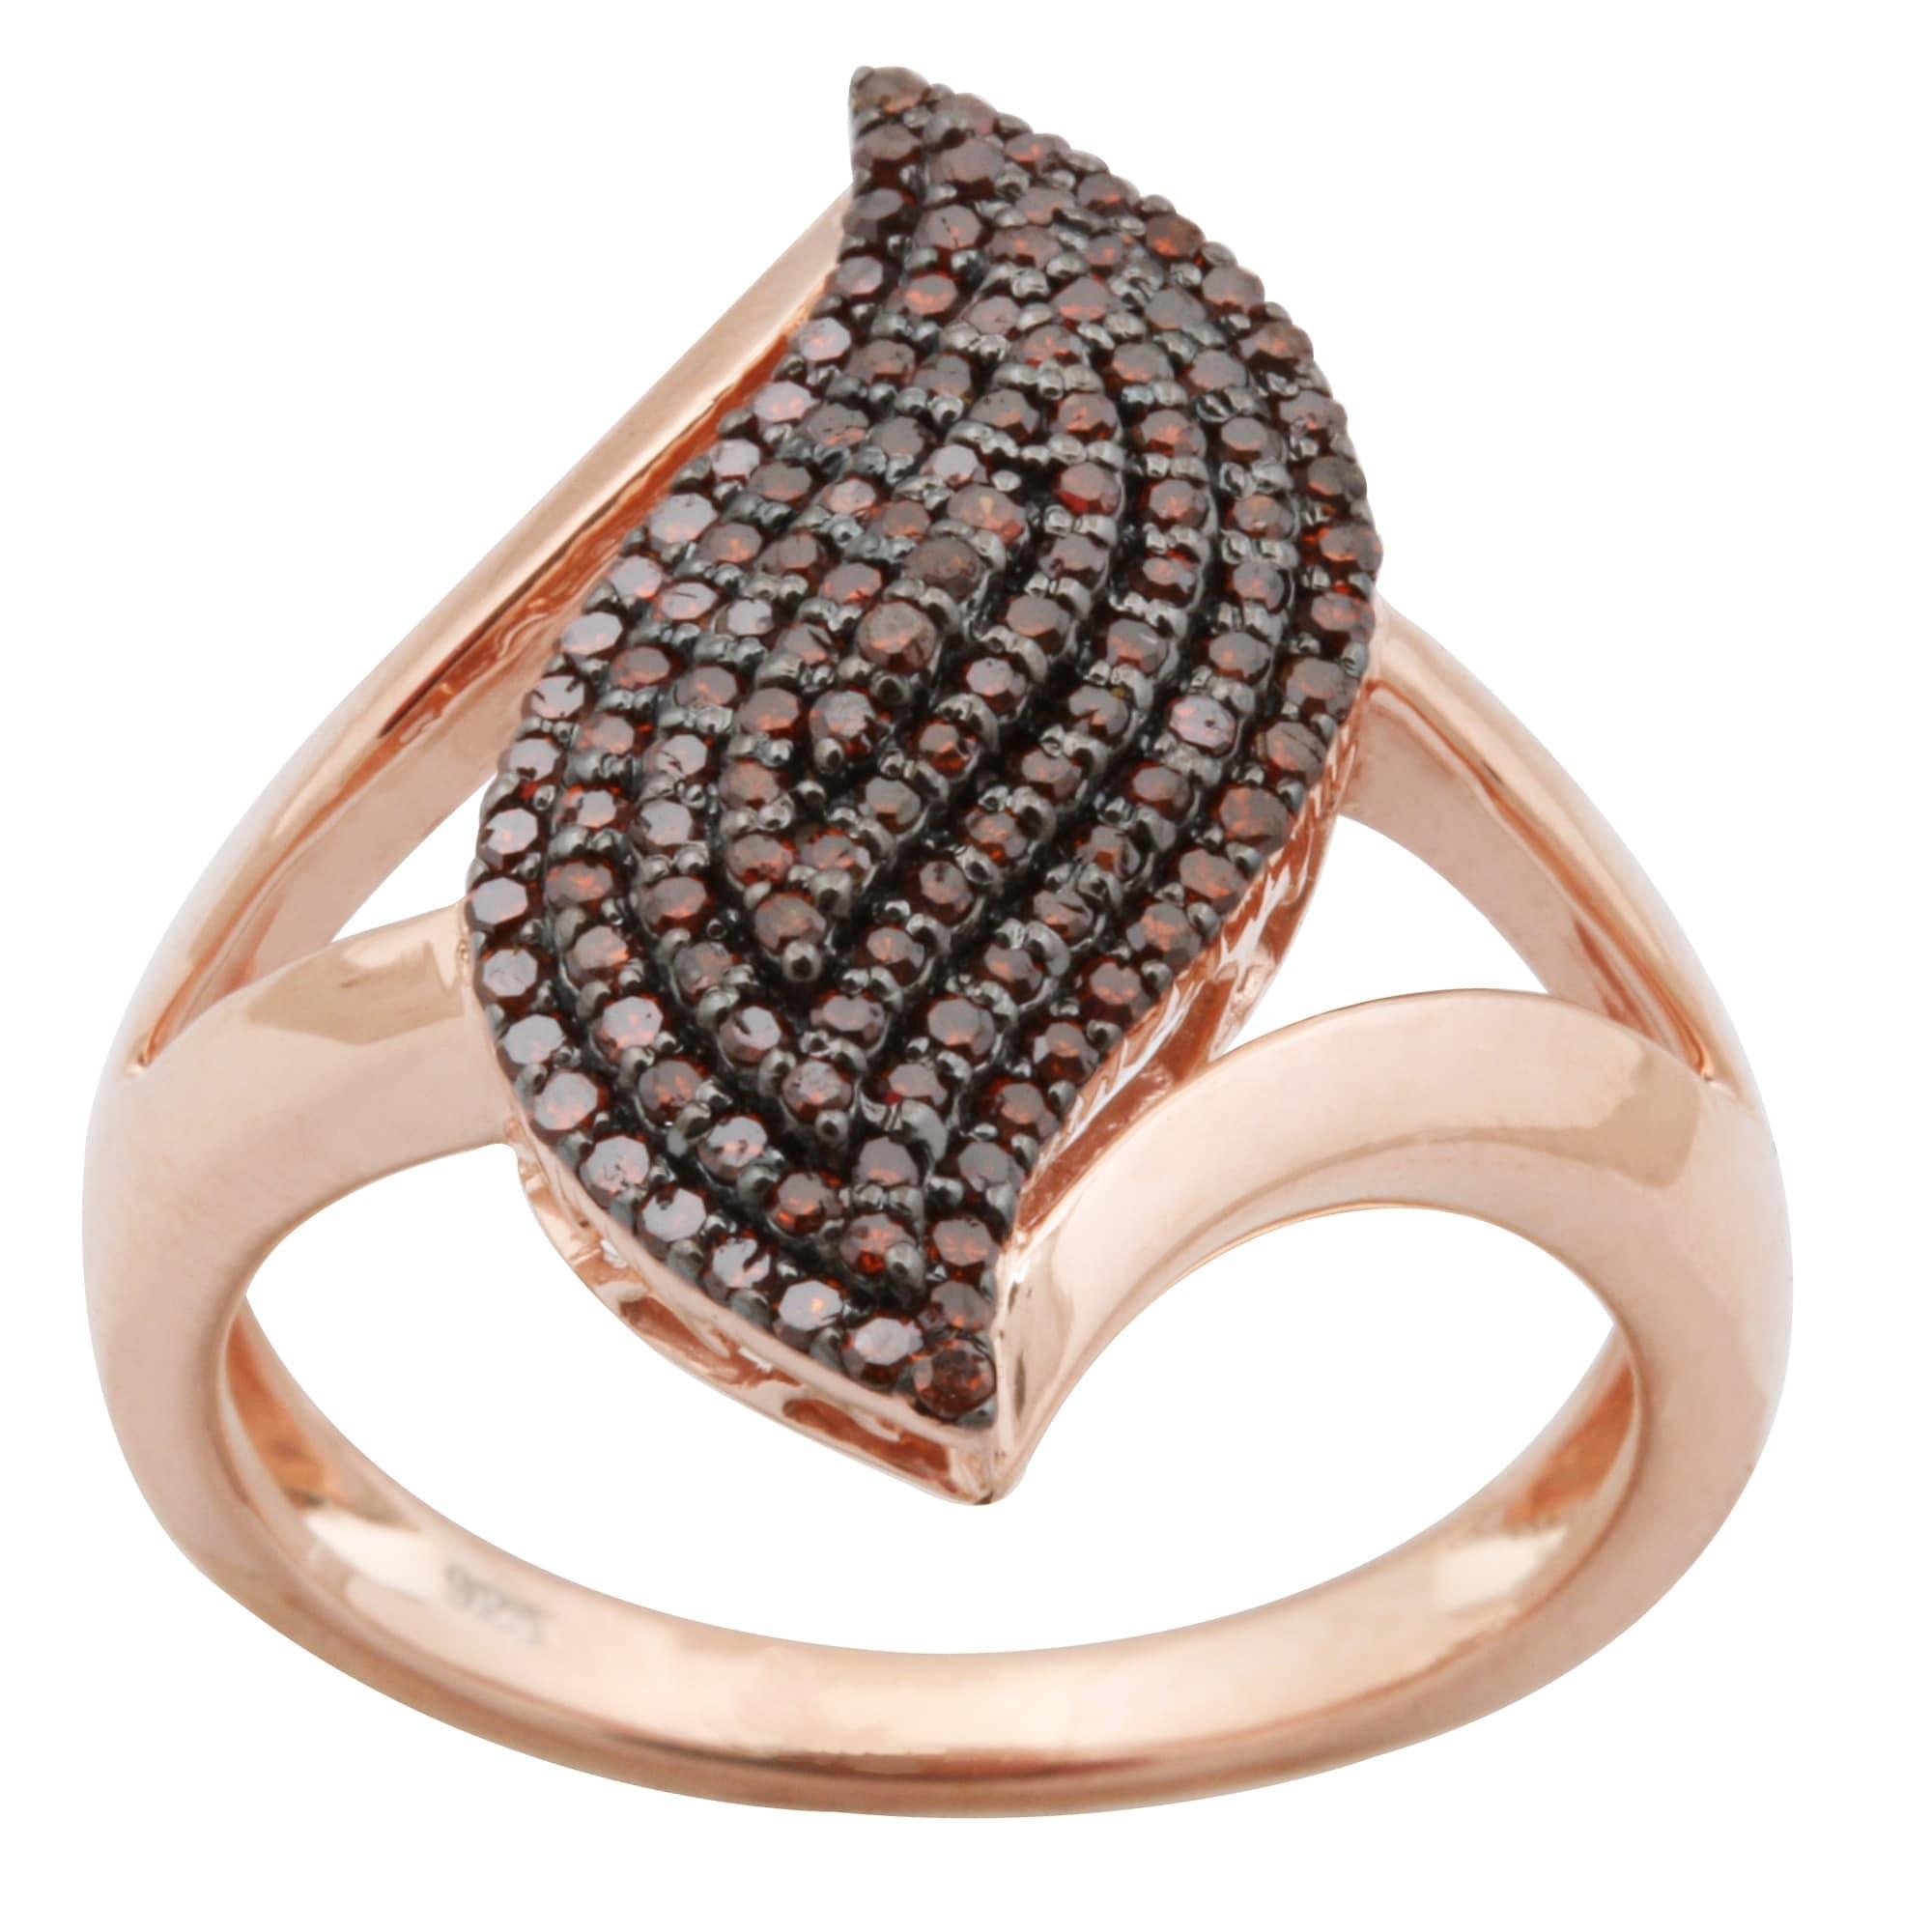 Brand New 0.51 Carat Real Cognac Diamond Designer Cluster Ring - Thumbnail 0